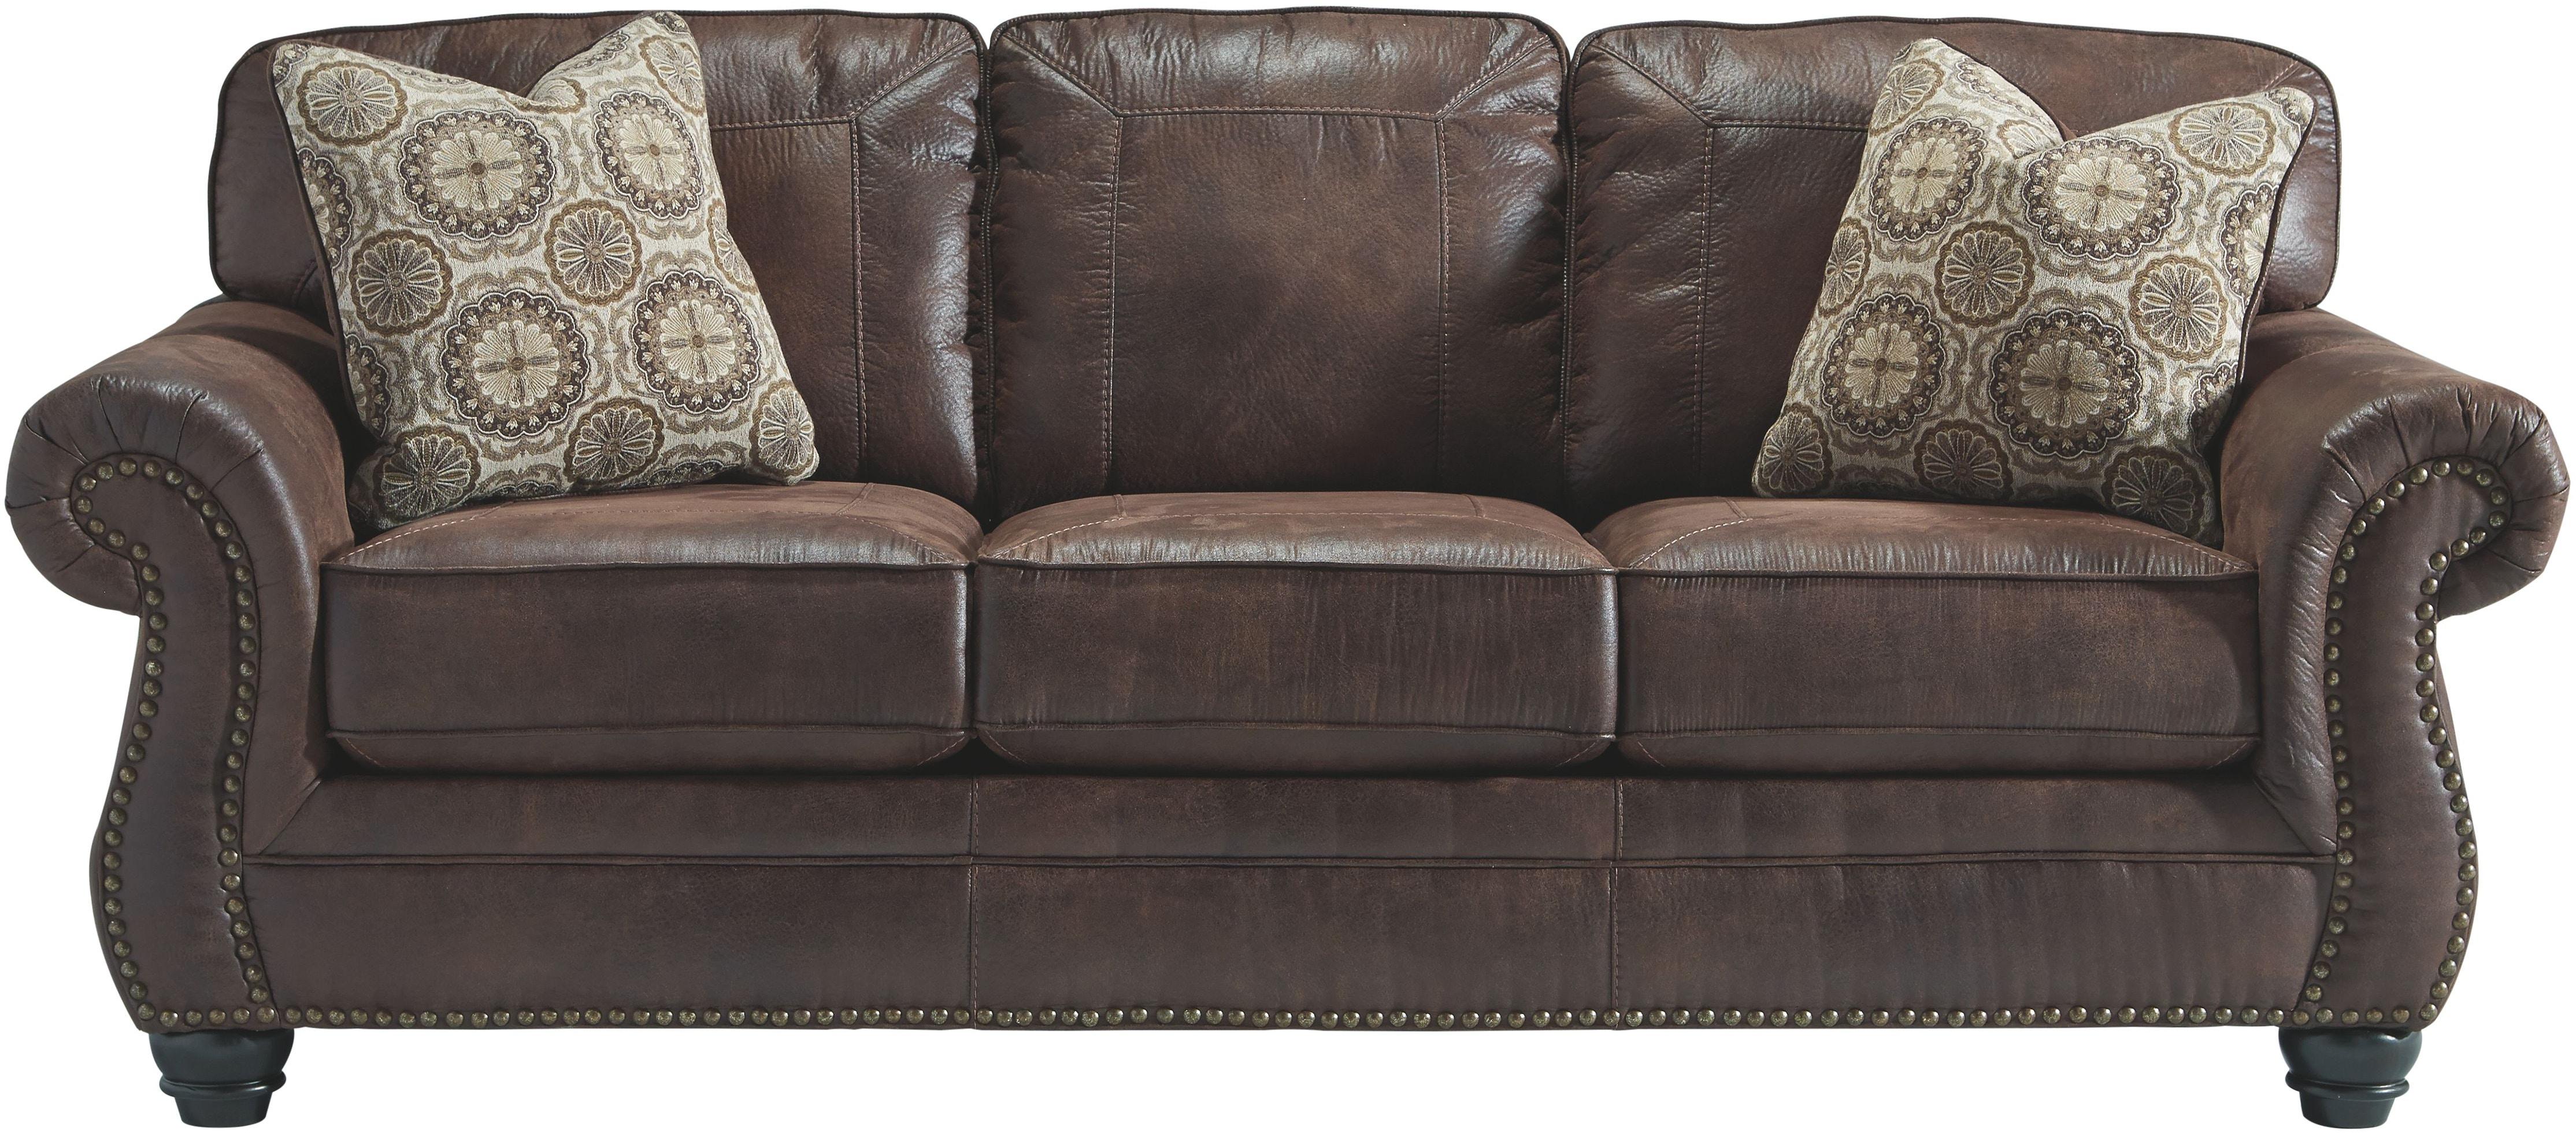 Living Room Furniture Ga living room furniture - tate furniture - phenix city, al and